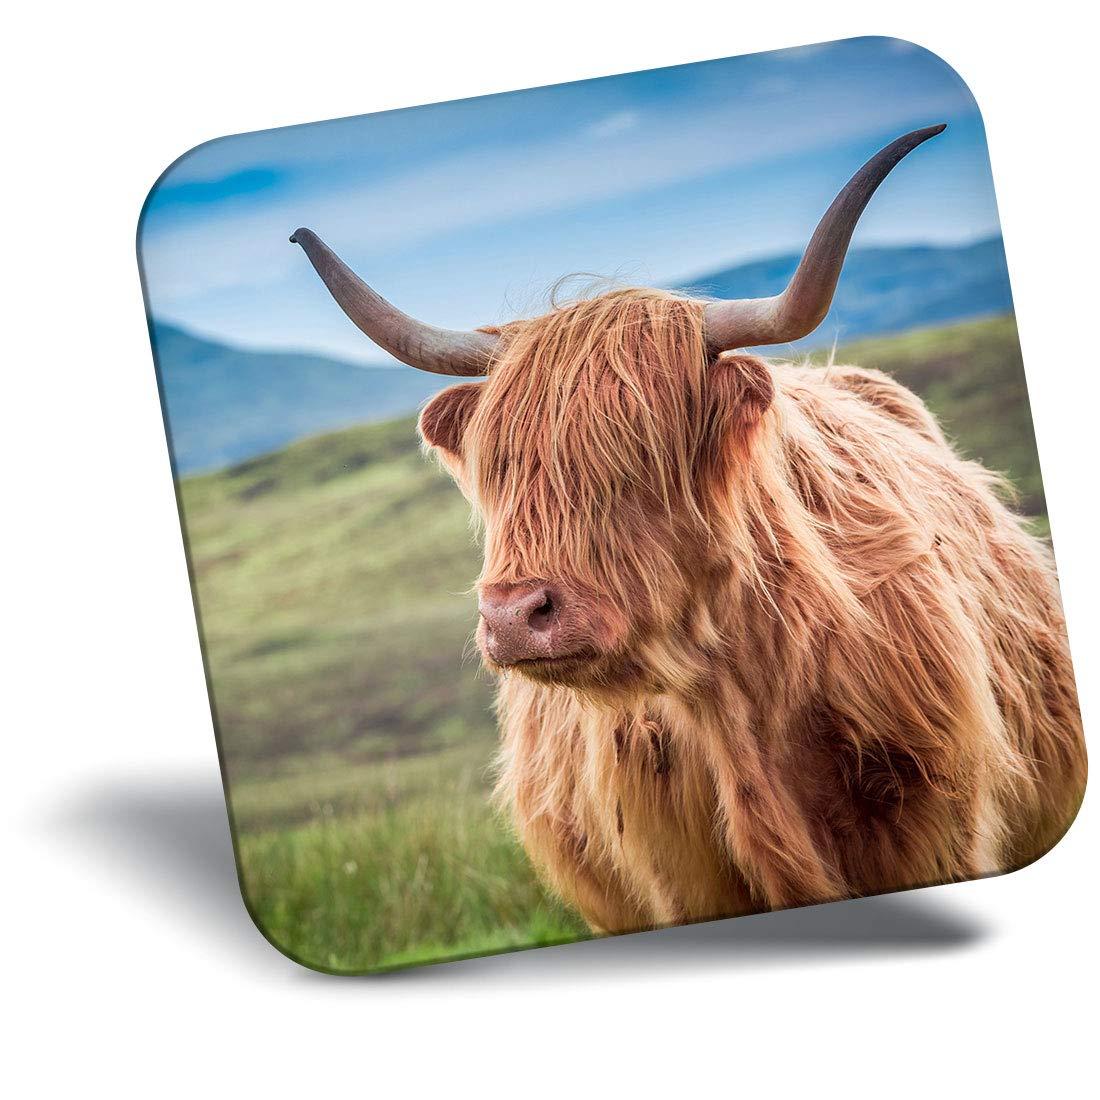 Destination Vinyl ltd Awesome Fridge Magnet - Hairy Highland Cow Scotland Horns 15762